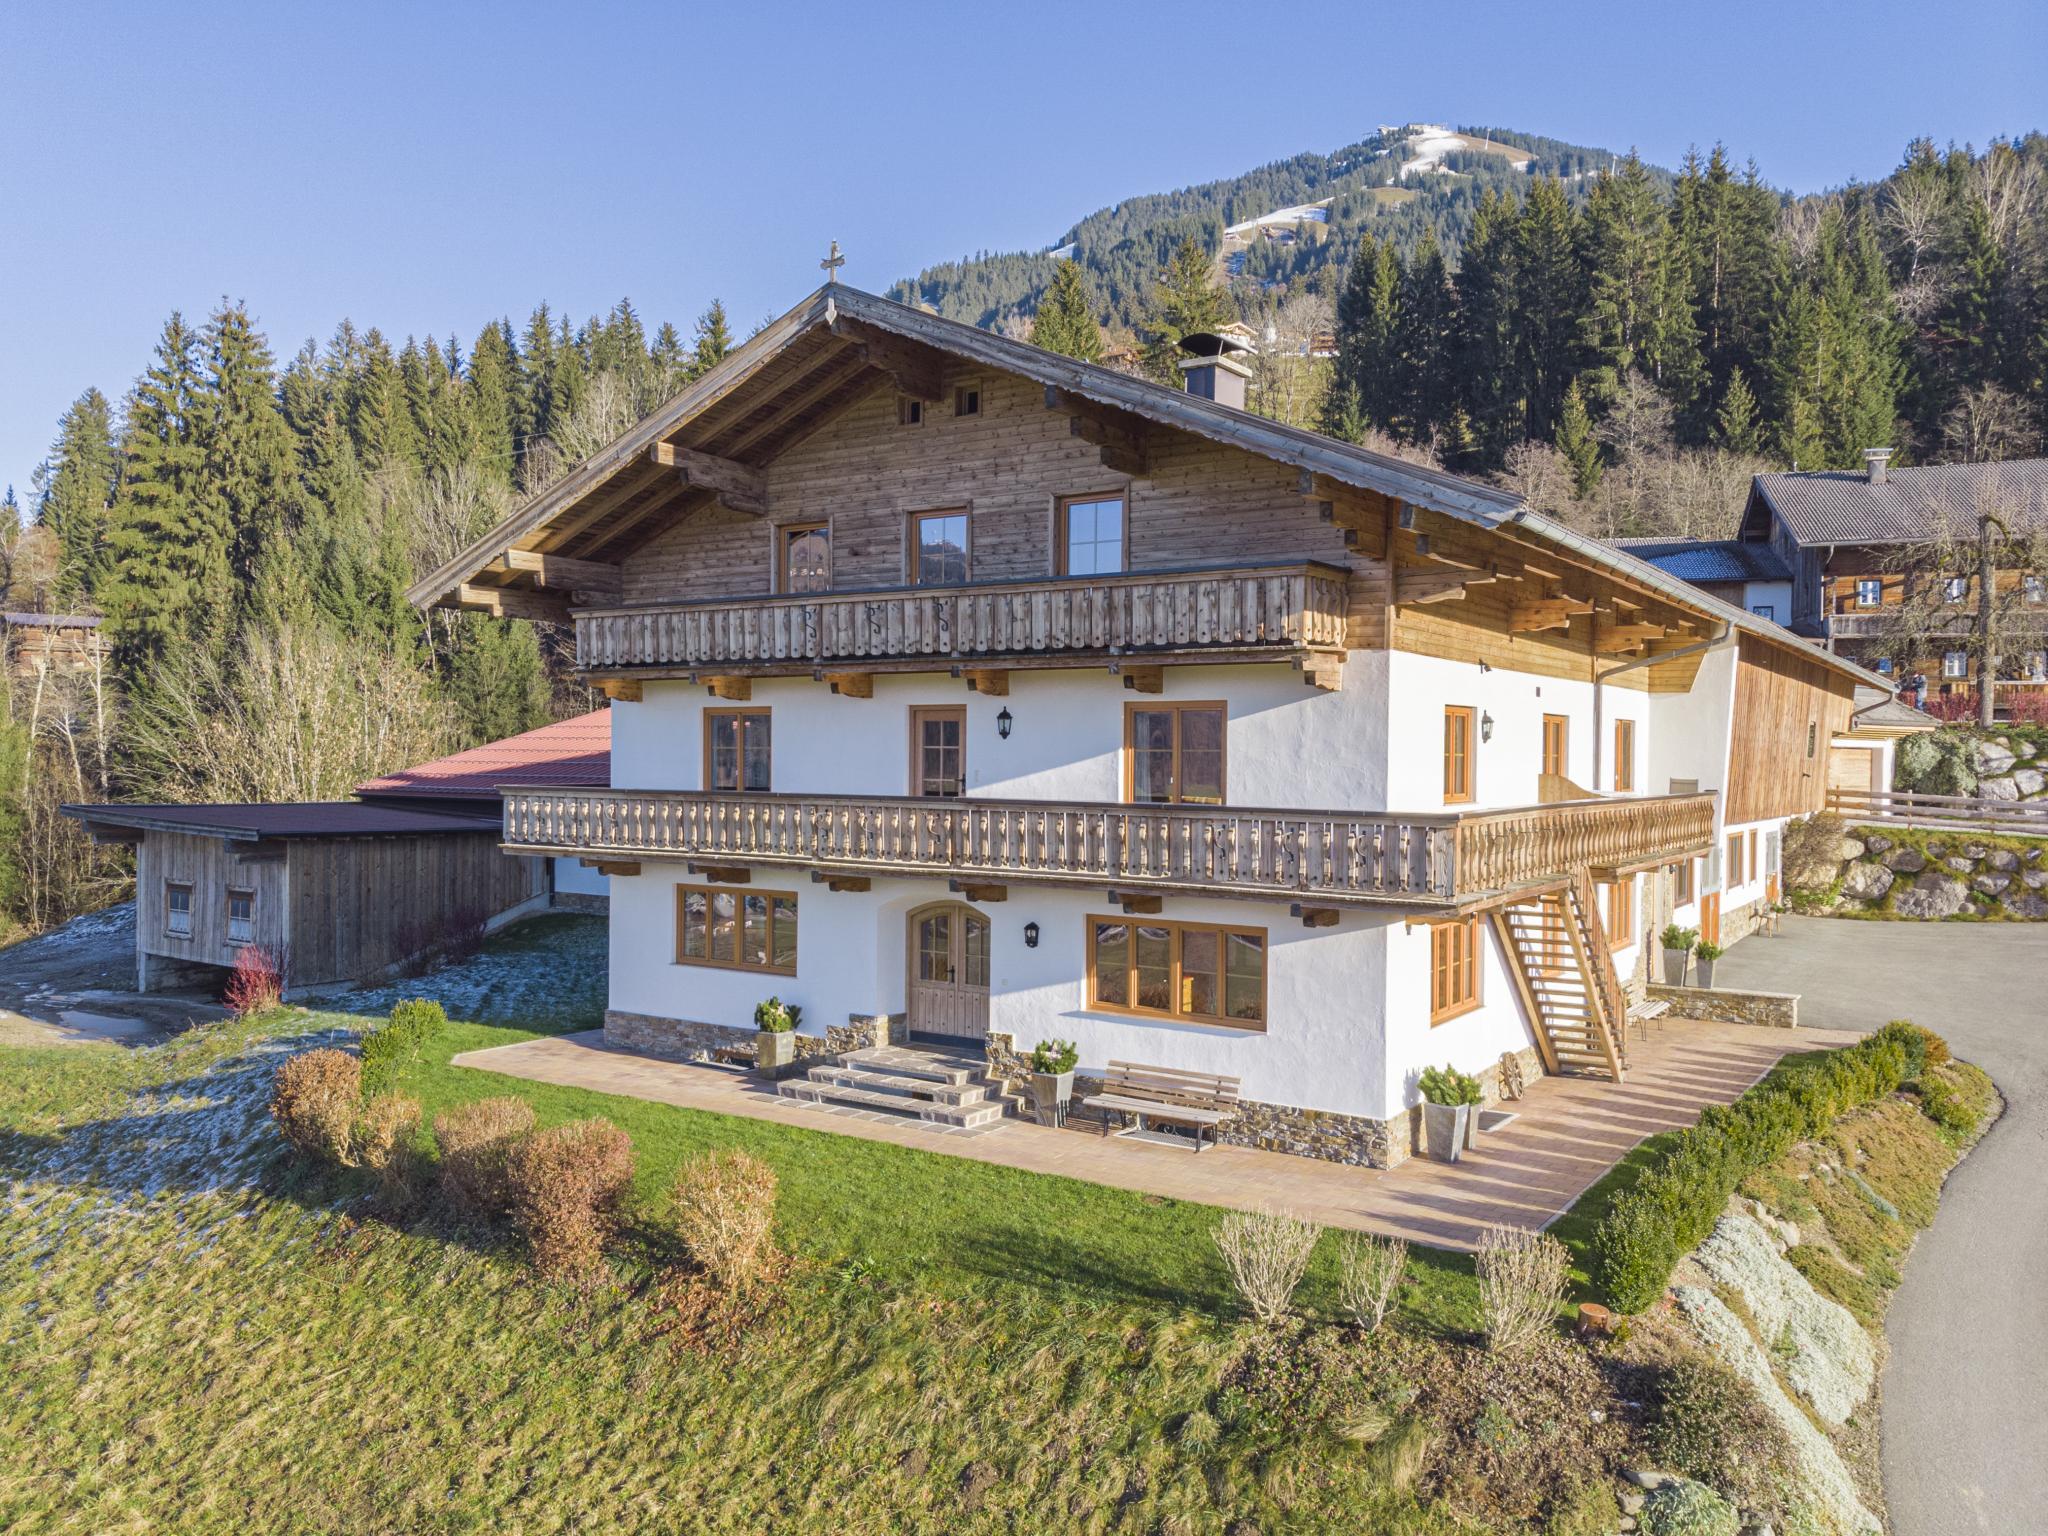 Glonersbühelhof Top 2 Tirol